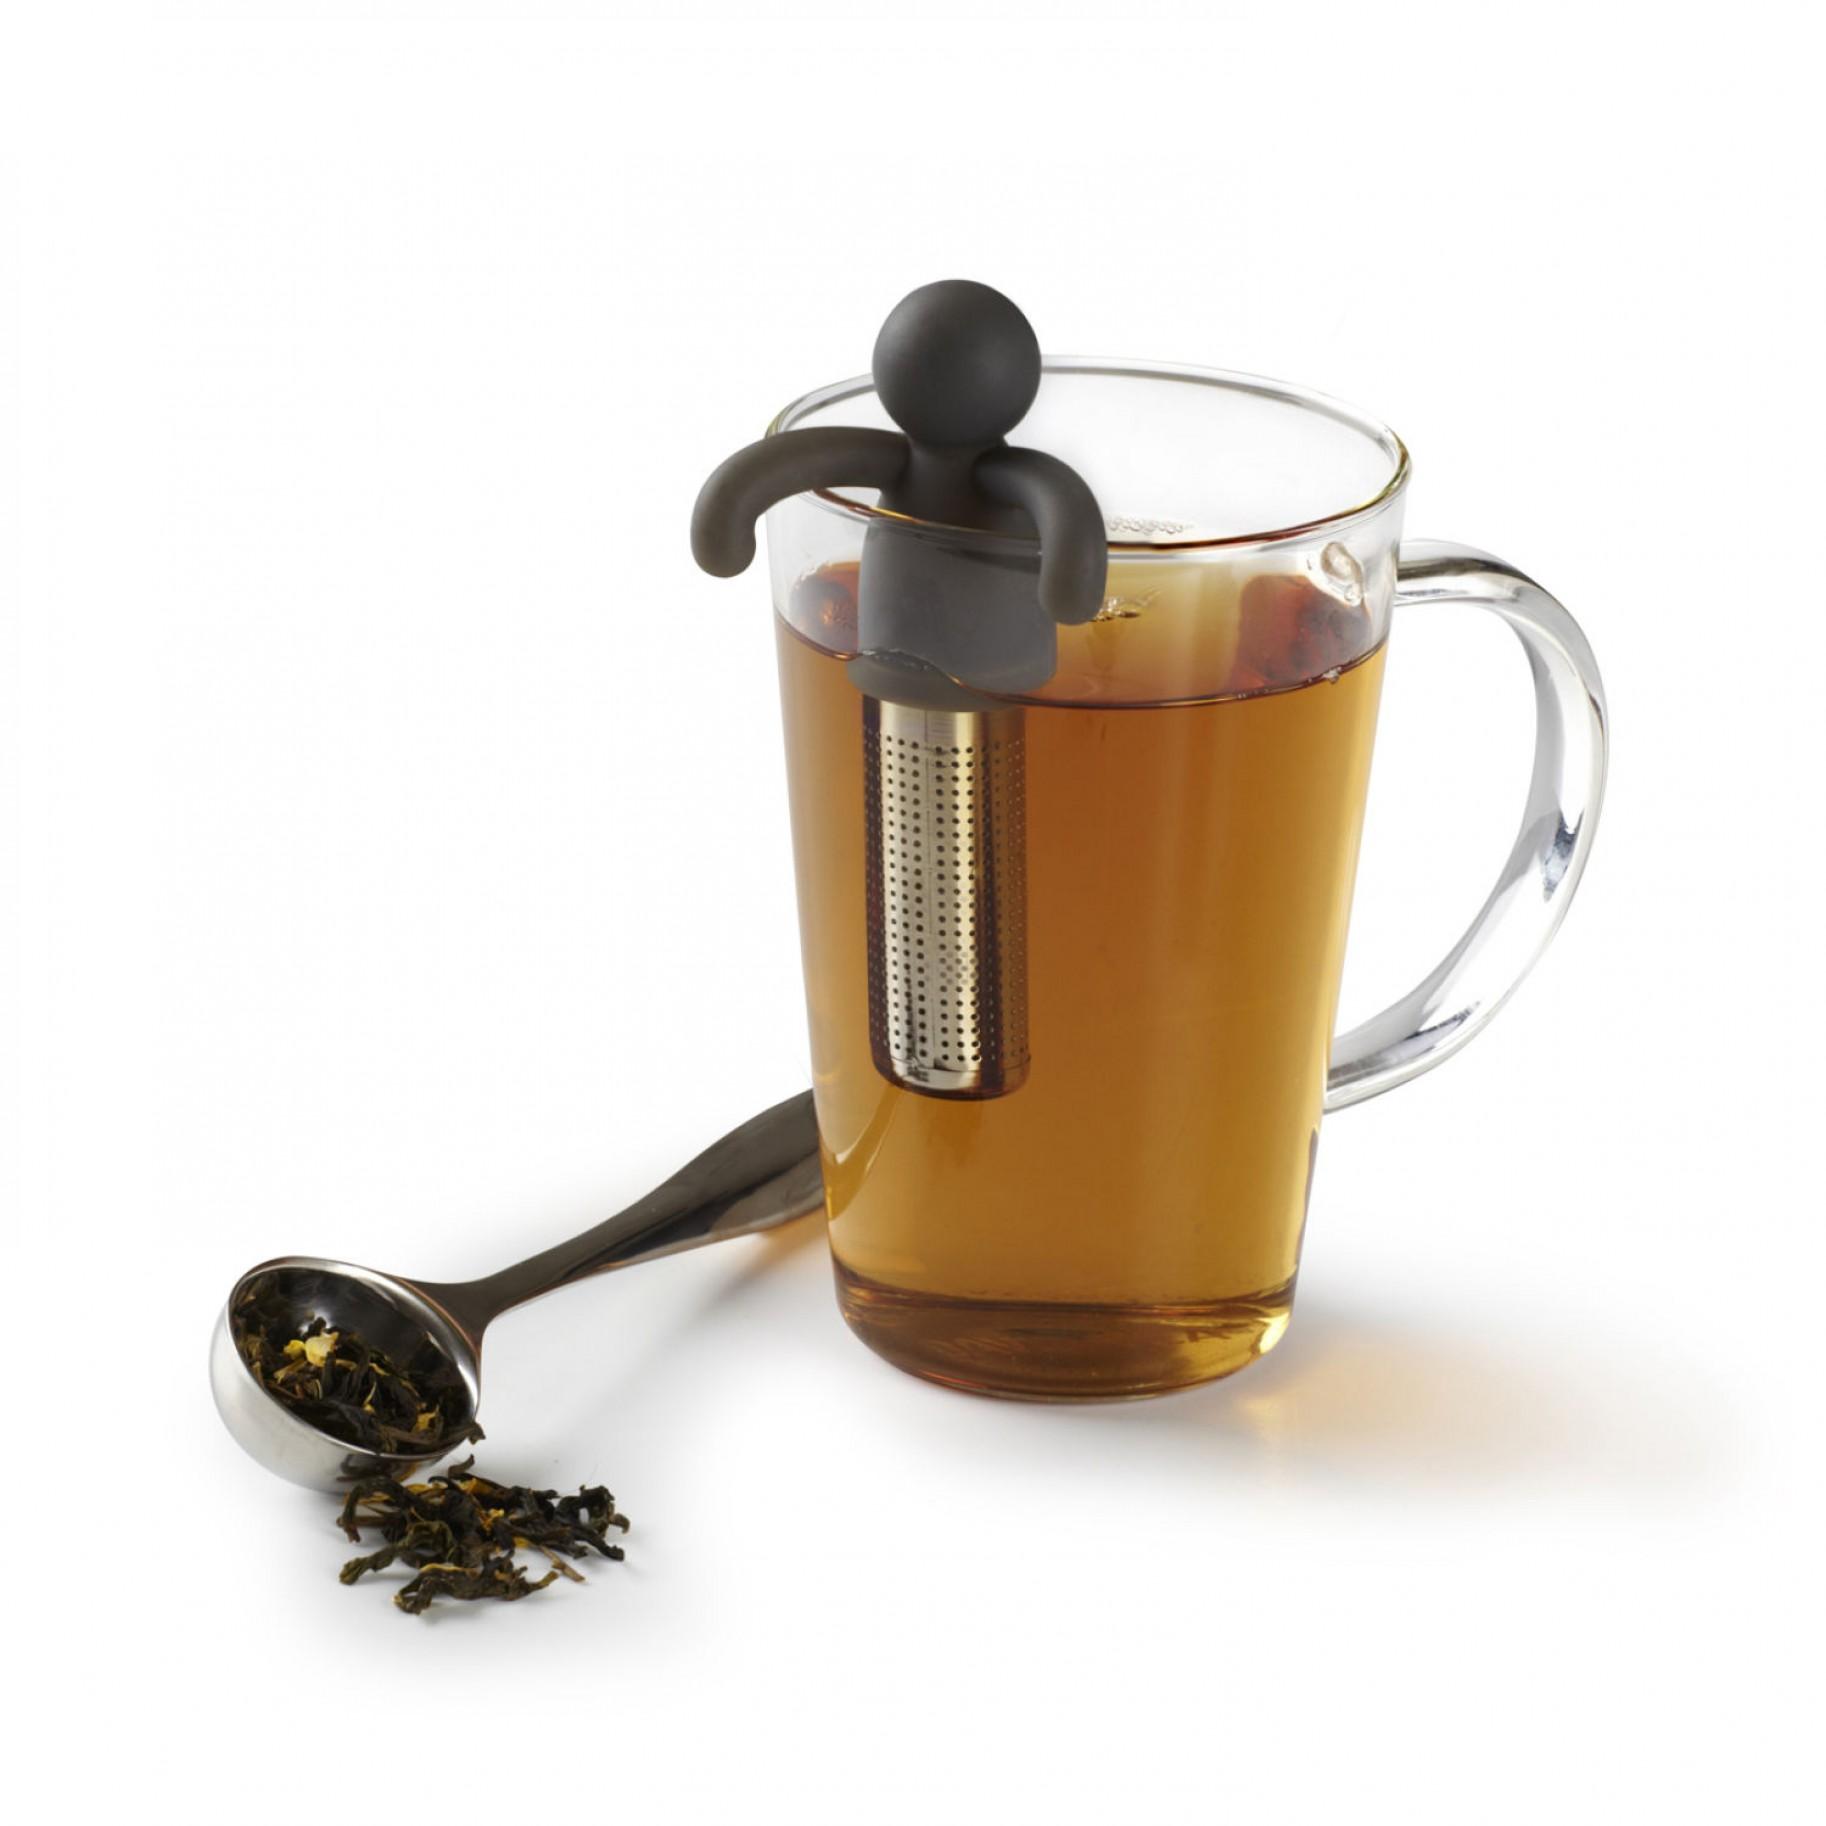 Umbra tea infuser € 10